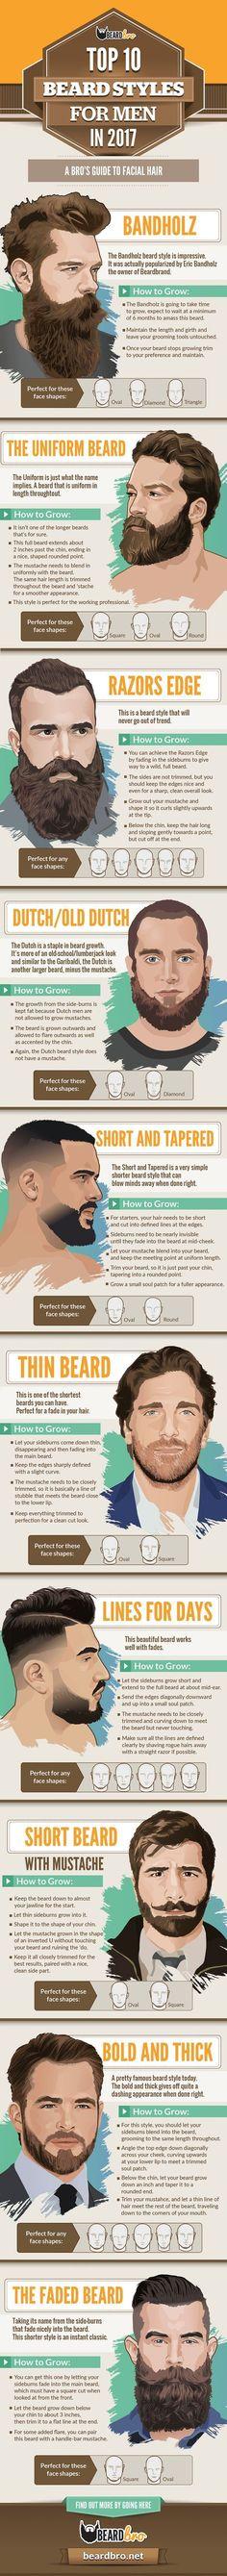 Top 23 Beard Styles for Men in 2017 - Beard Bro